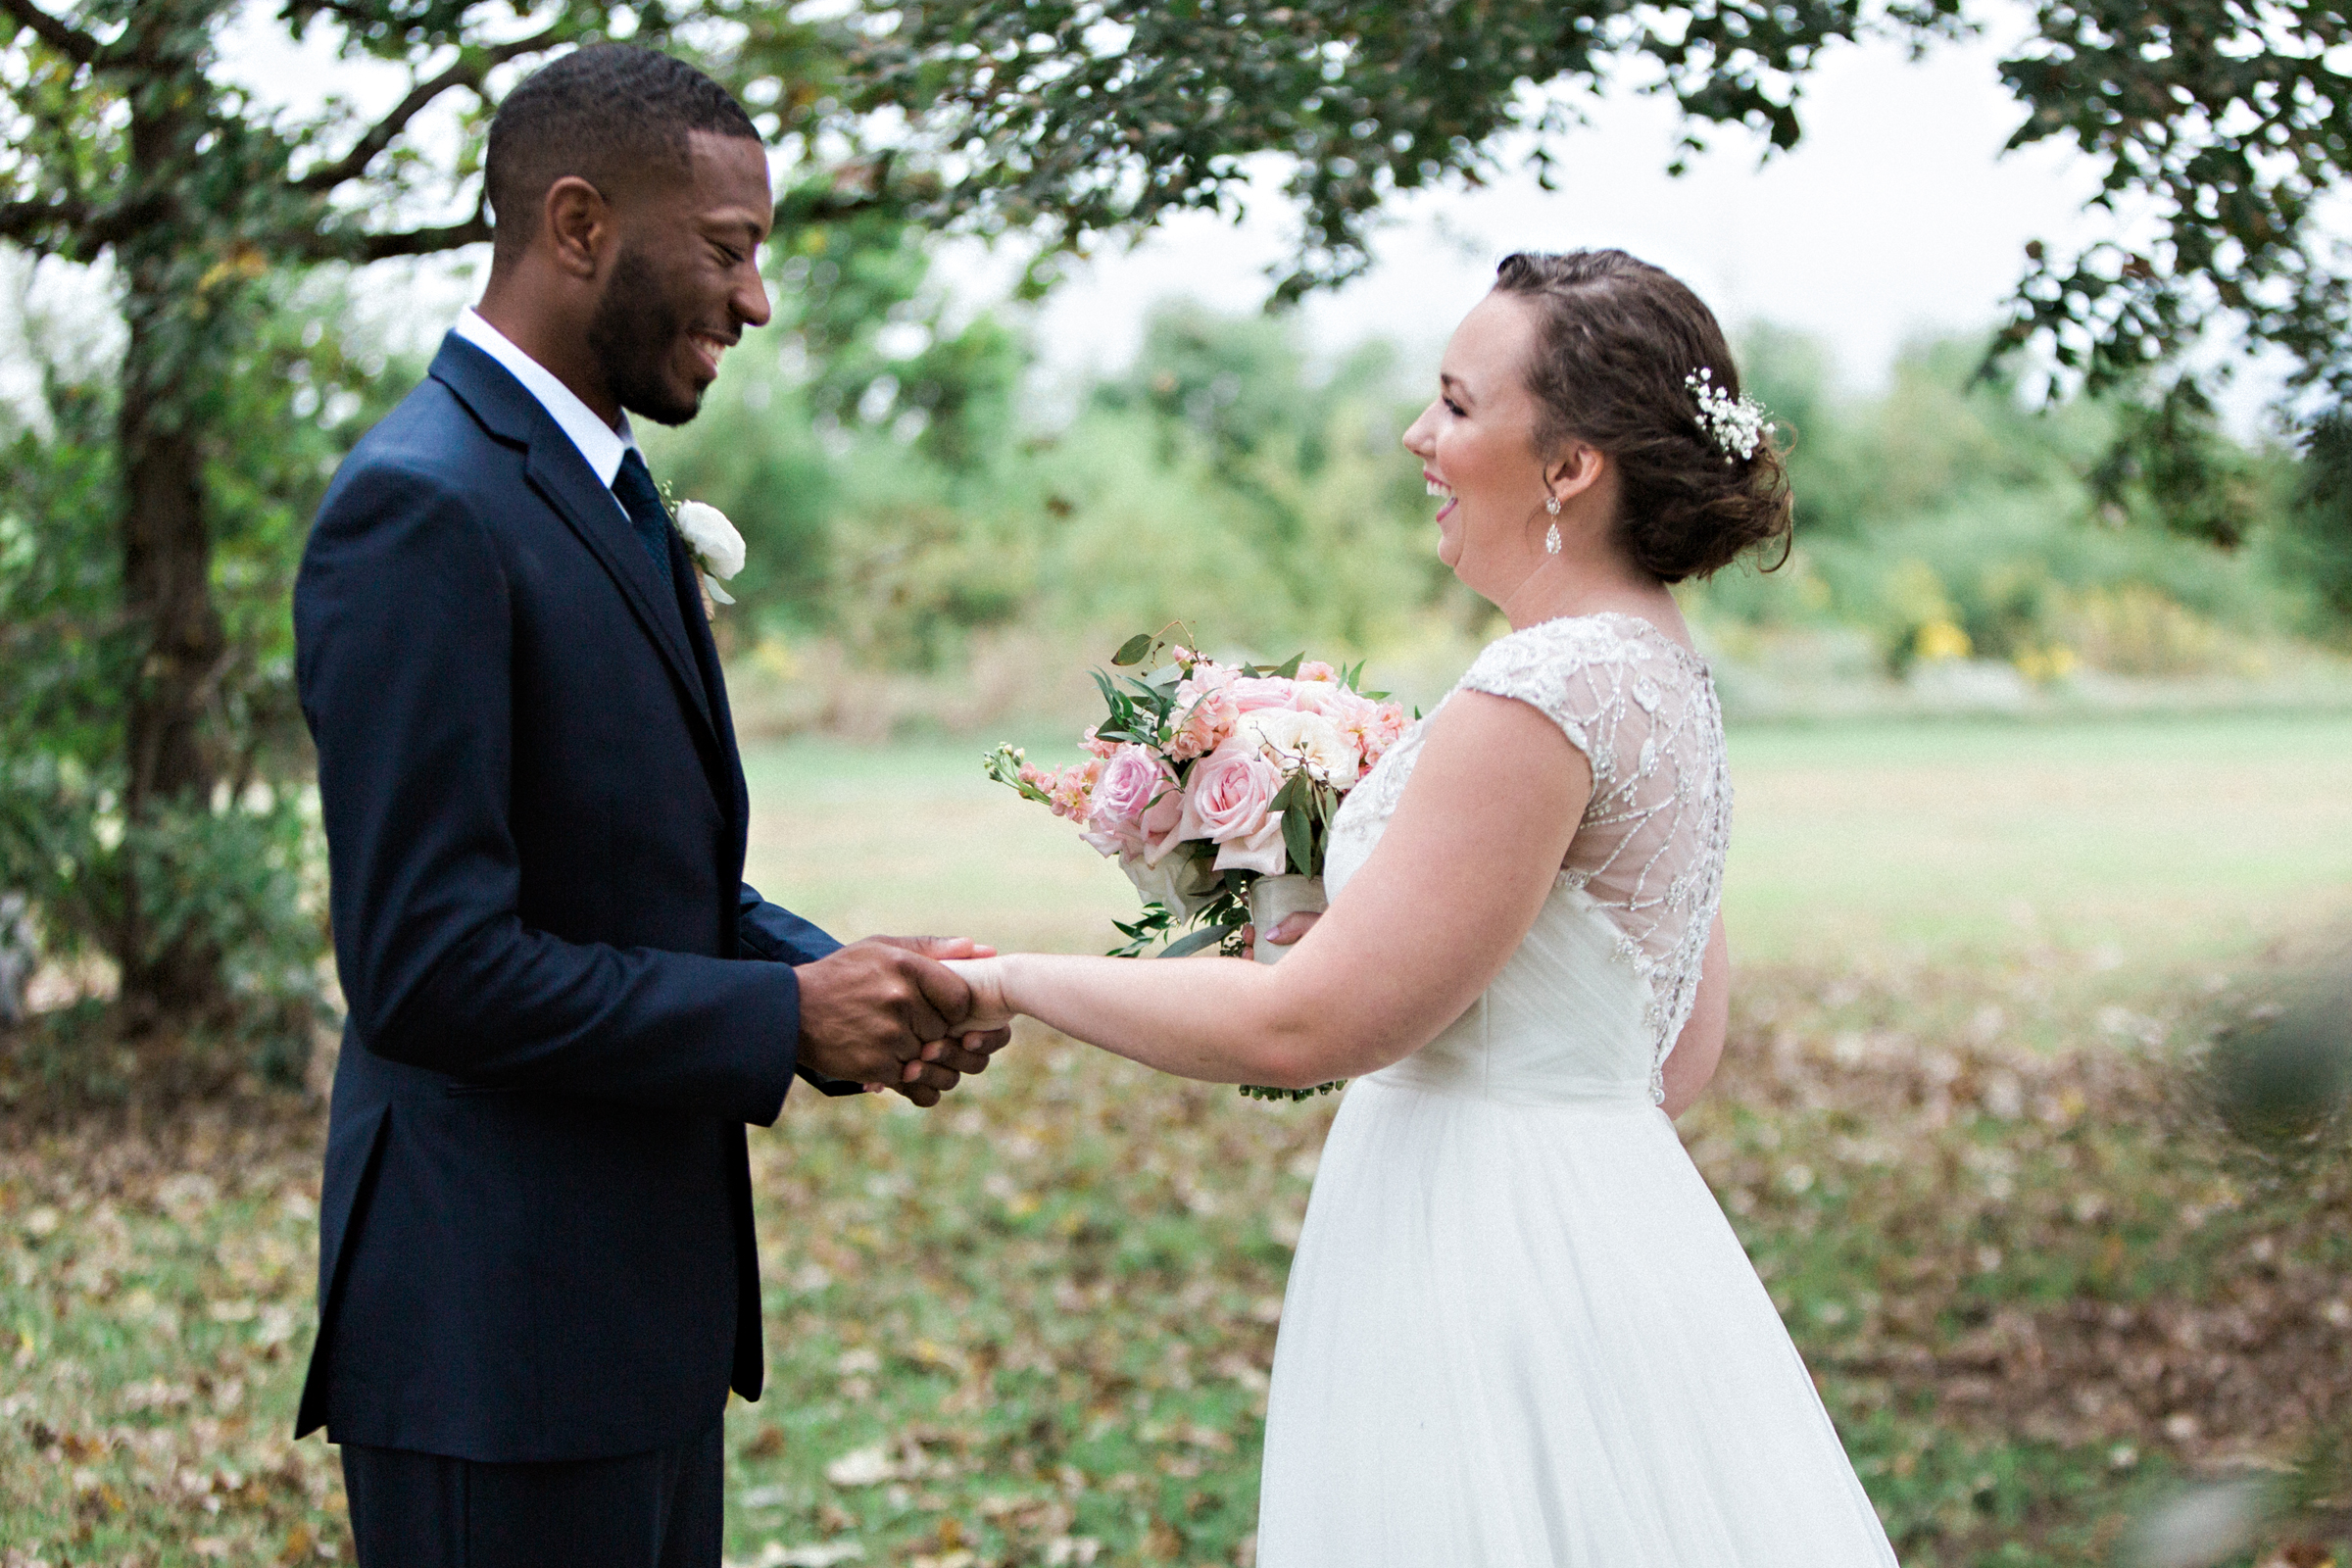 Alabama-Wedding-Photography-Nick-Drollette-Cory-Laura-122.jpg